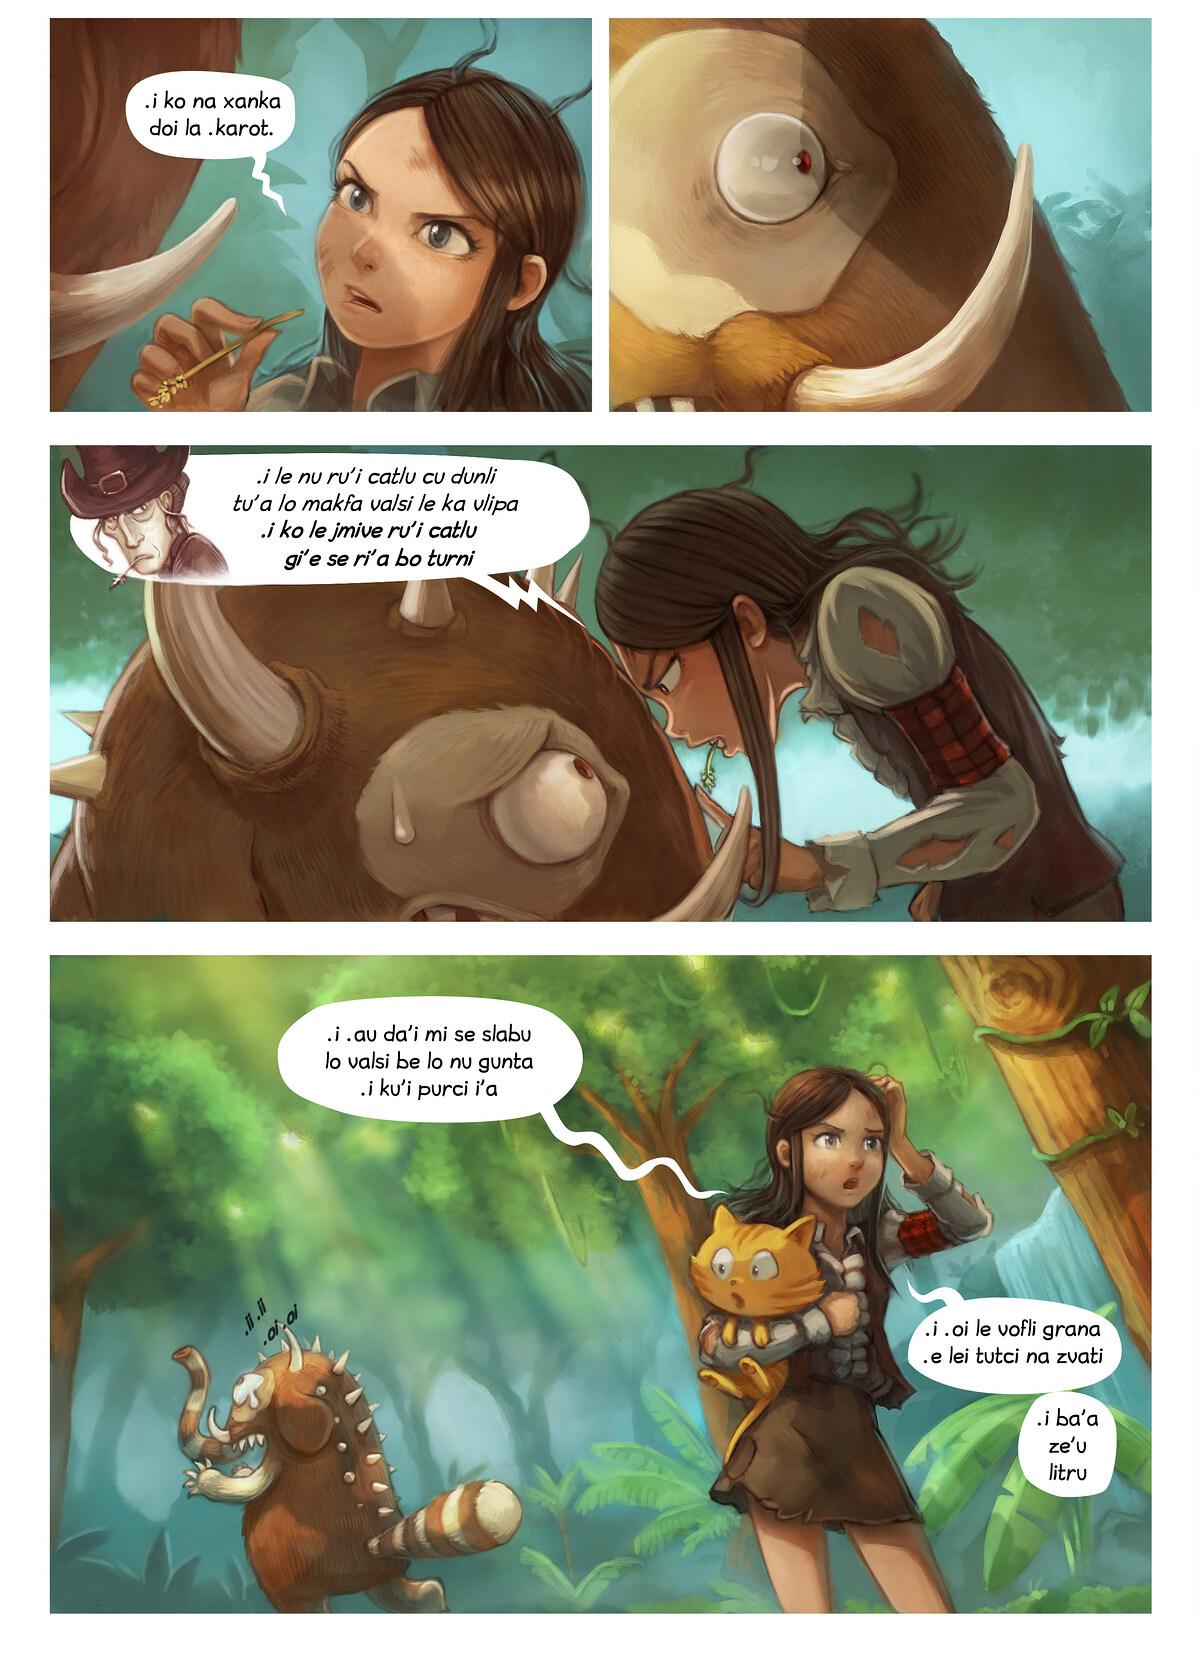 A webcomic page of Pepper&Carrot, pagbu 17 [jb], papri 4